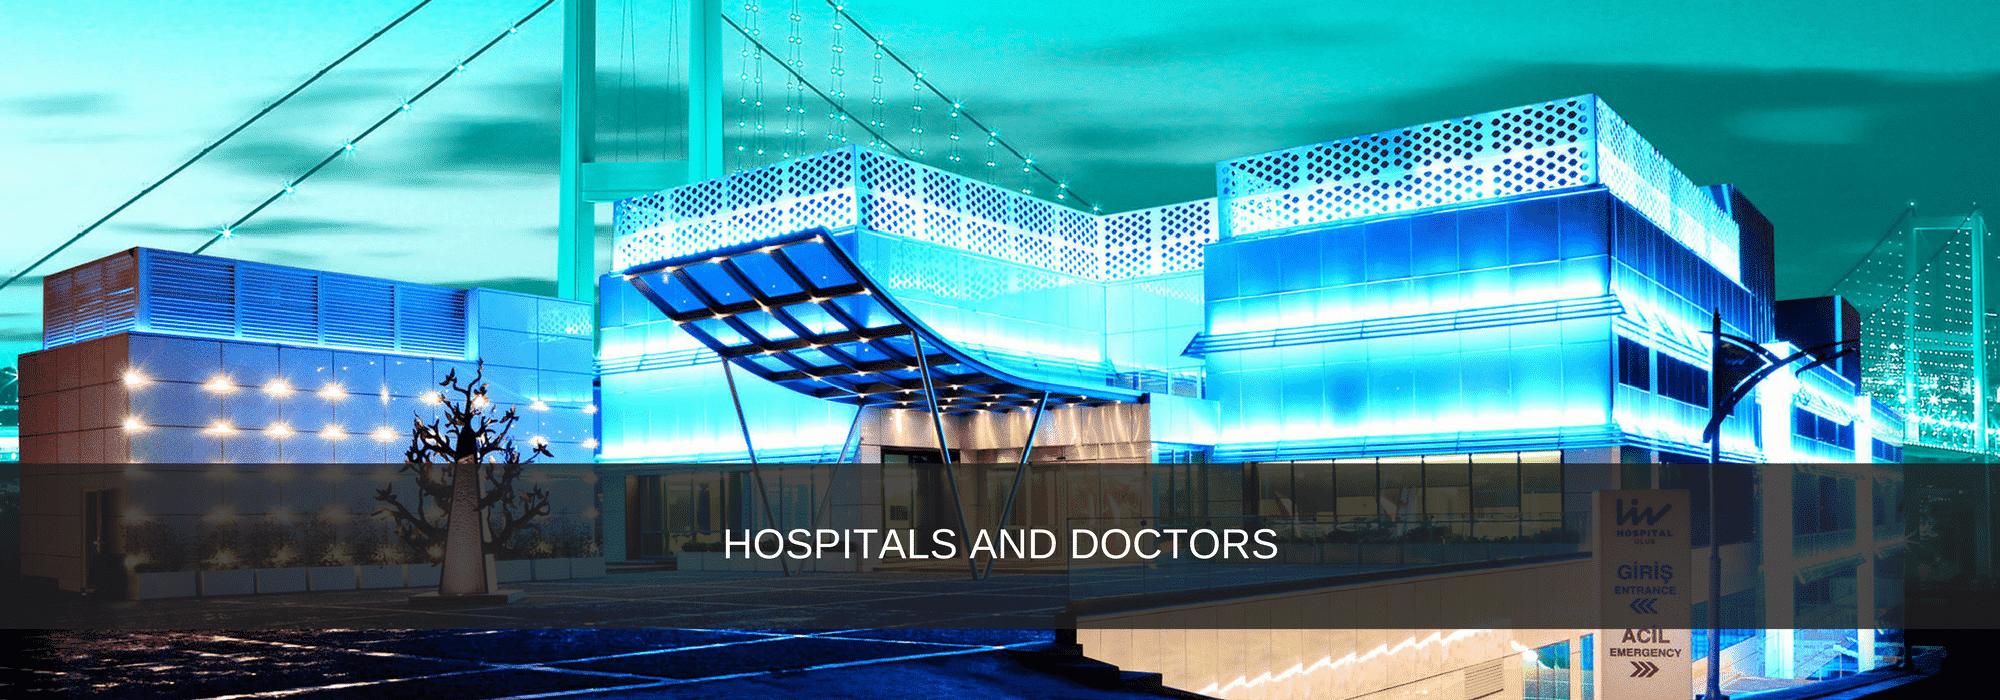 Hospitals and Doctors FAQ - Global Medical Care